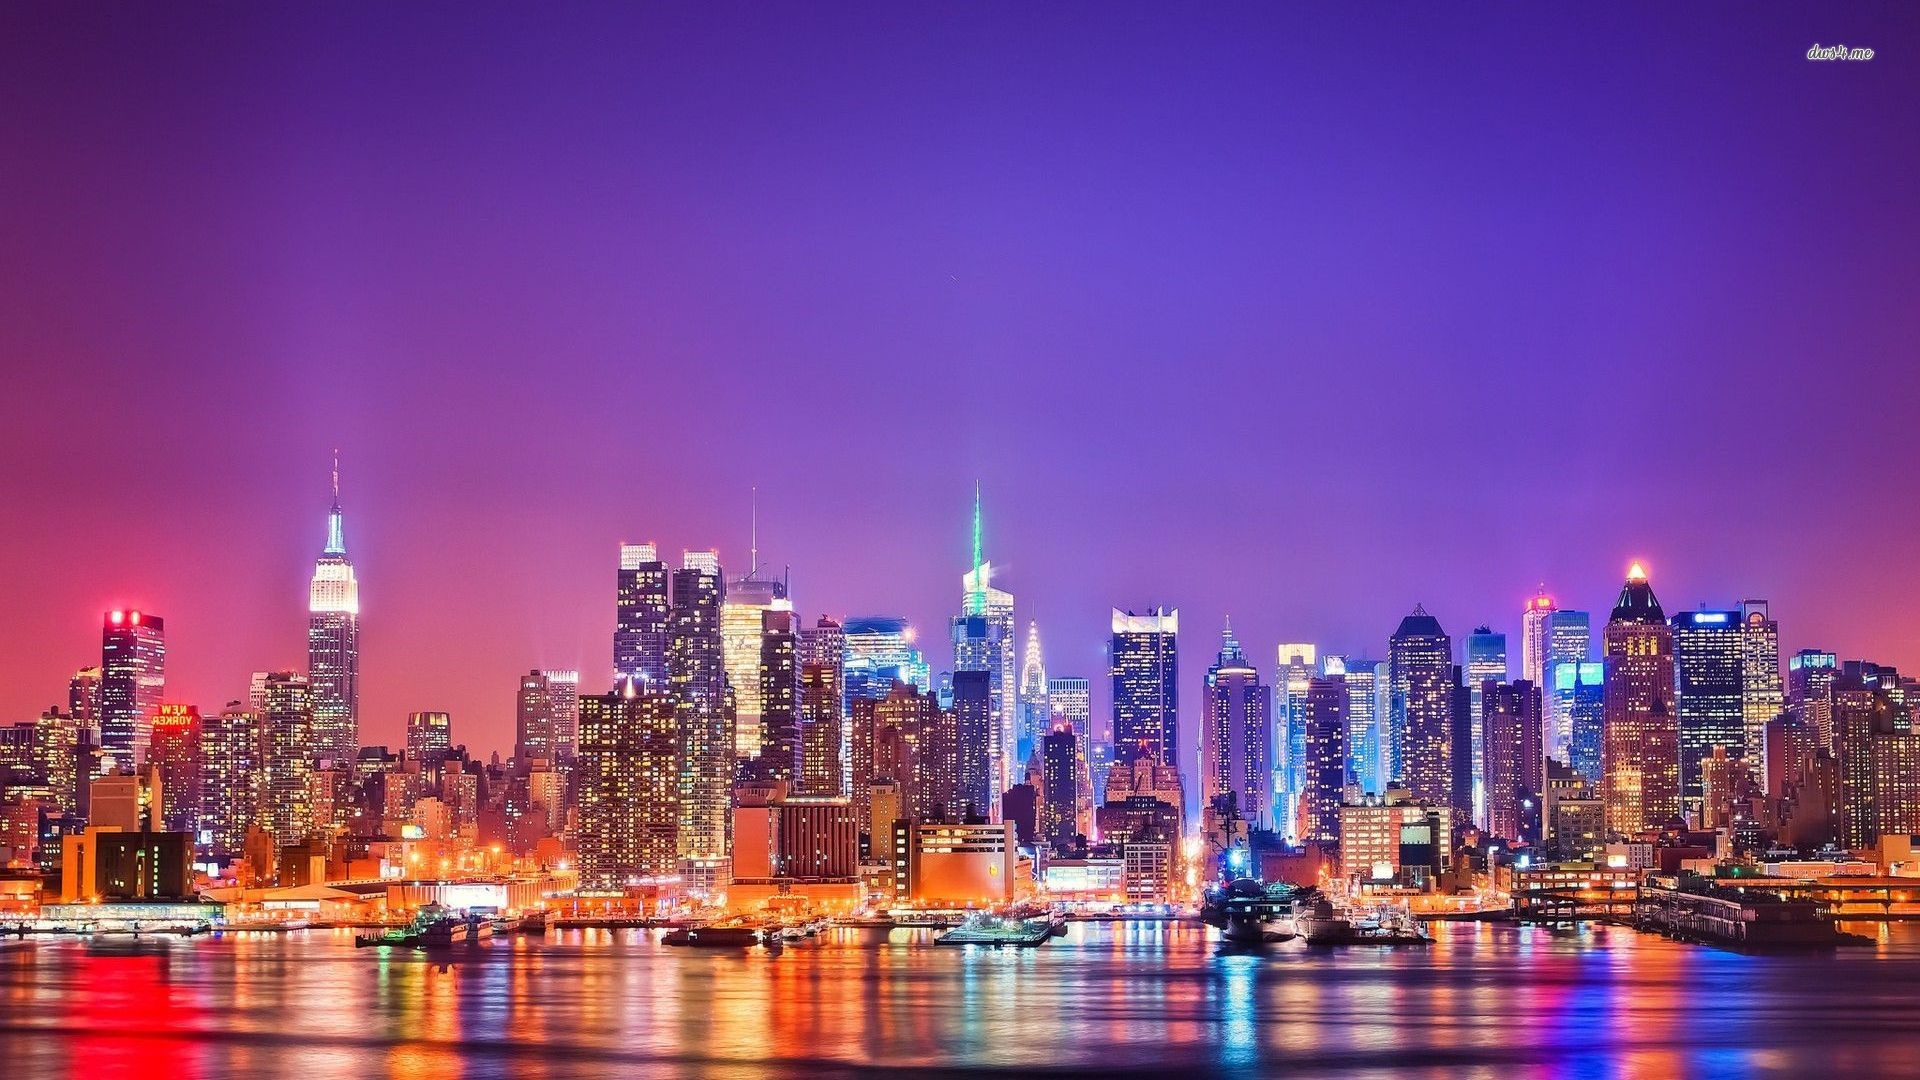 New York Skyline Hd Wallpaper – DriverLayer Search Engine